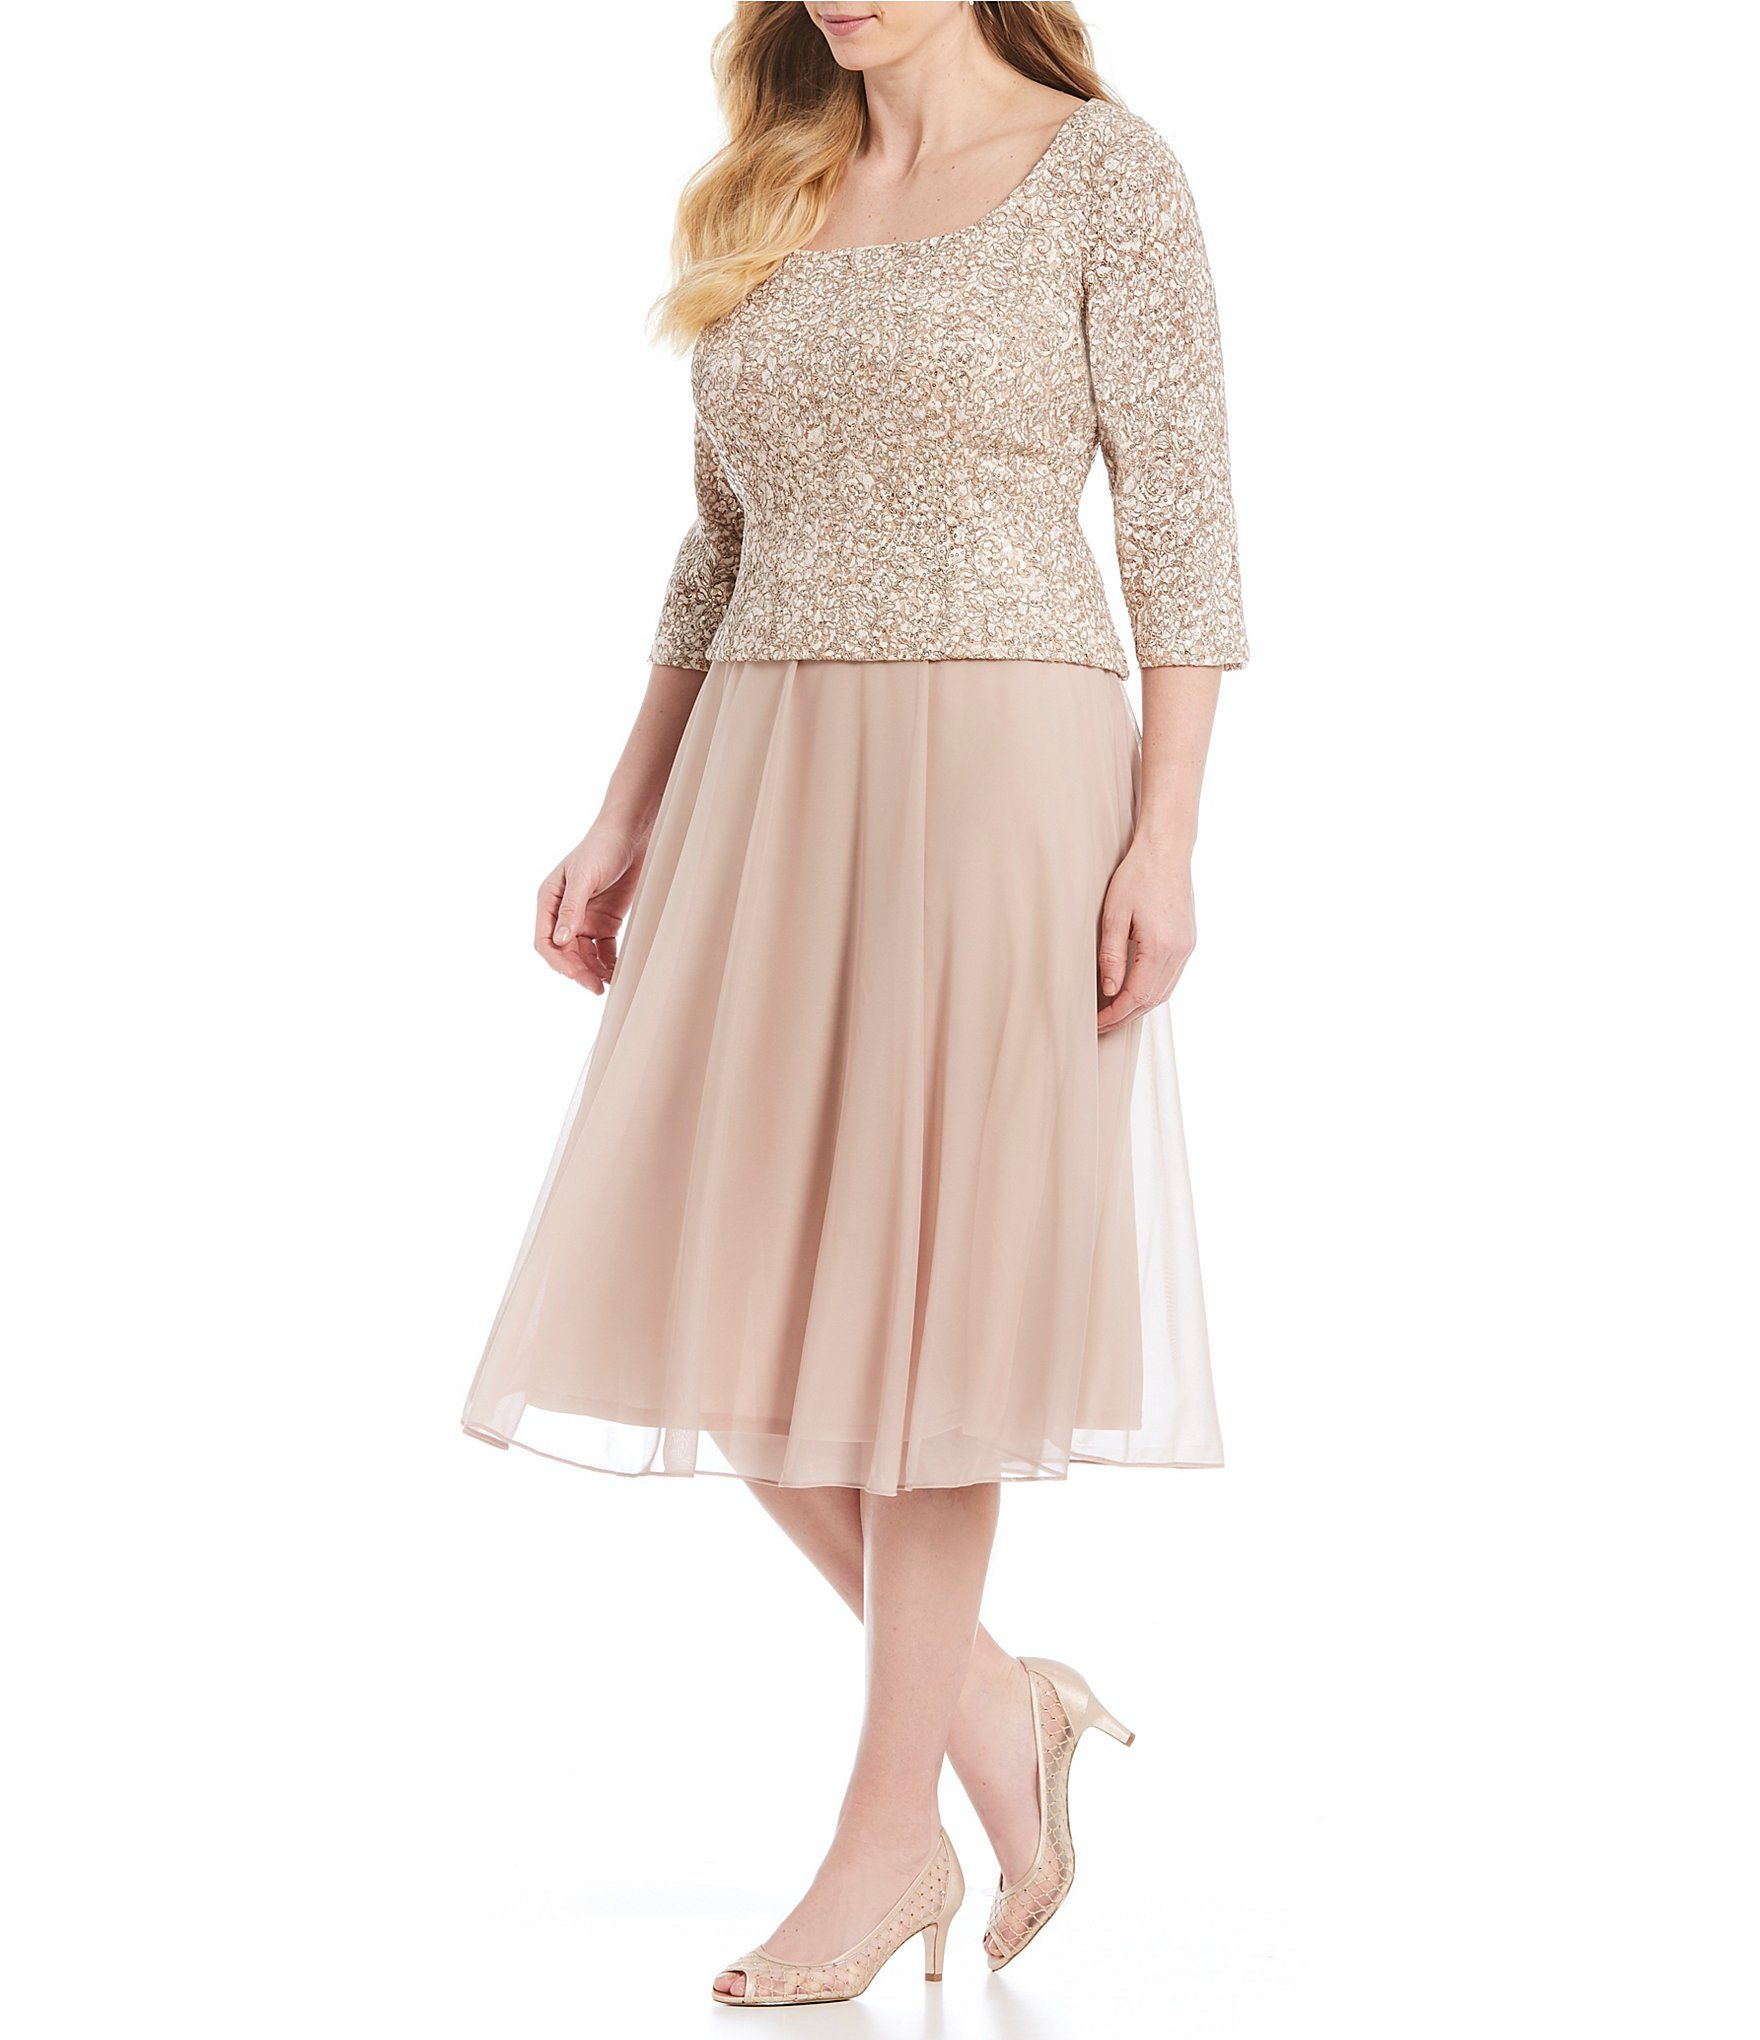 Shop For Alex Evenings Plus Size 3 4 Sleeve Mock 2 Piece Midi Dress At Dillards Com Visit Dillards Plus Size Cocktail Dresses Plus Size Formal Dresses Dresses [ 2040 x 1760 Pixel ]